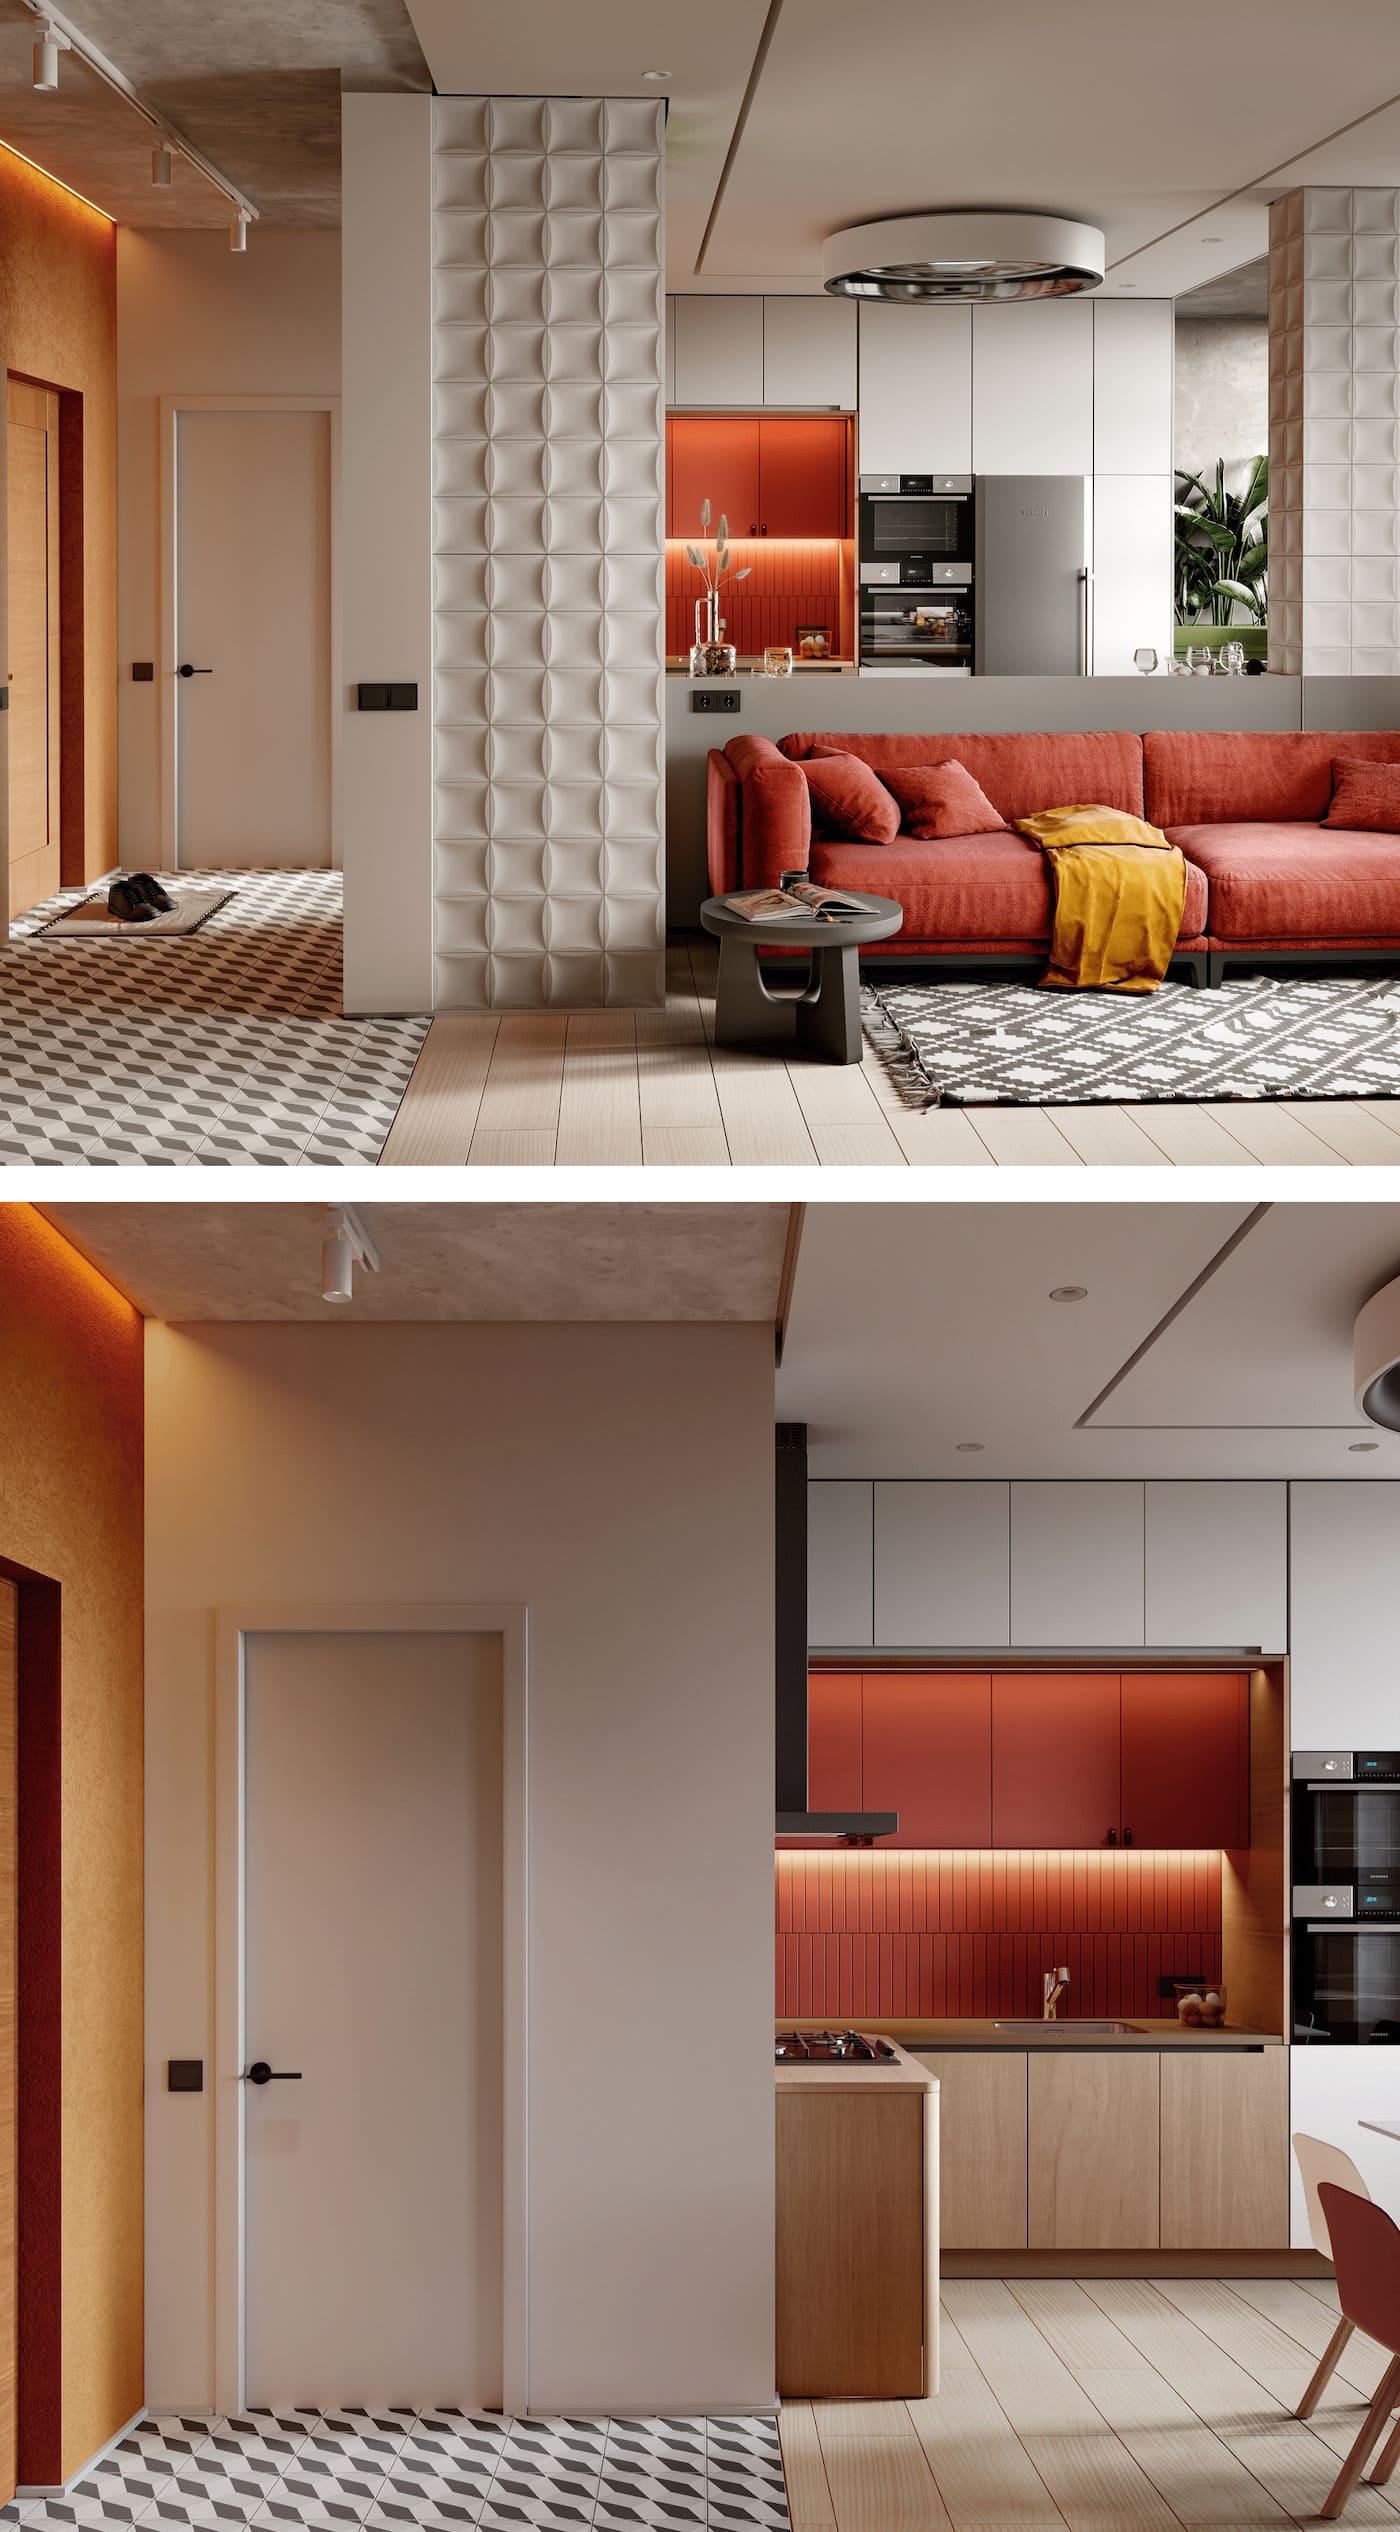 дизайн однокомнатной квартиры фото 26